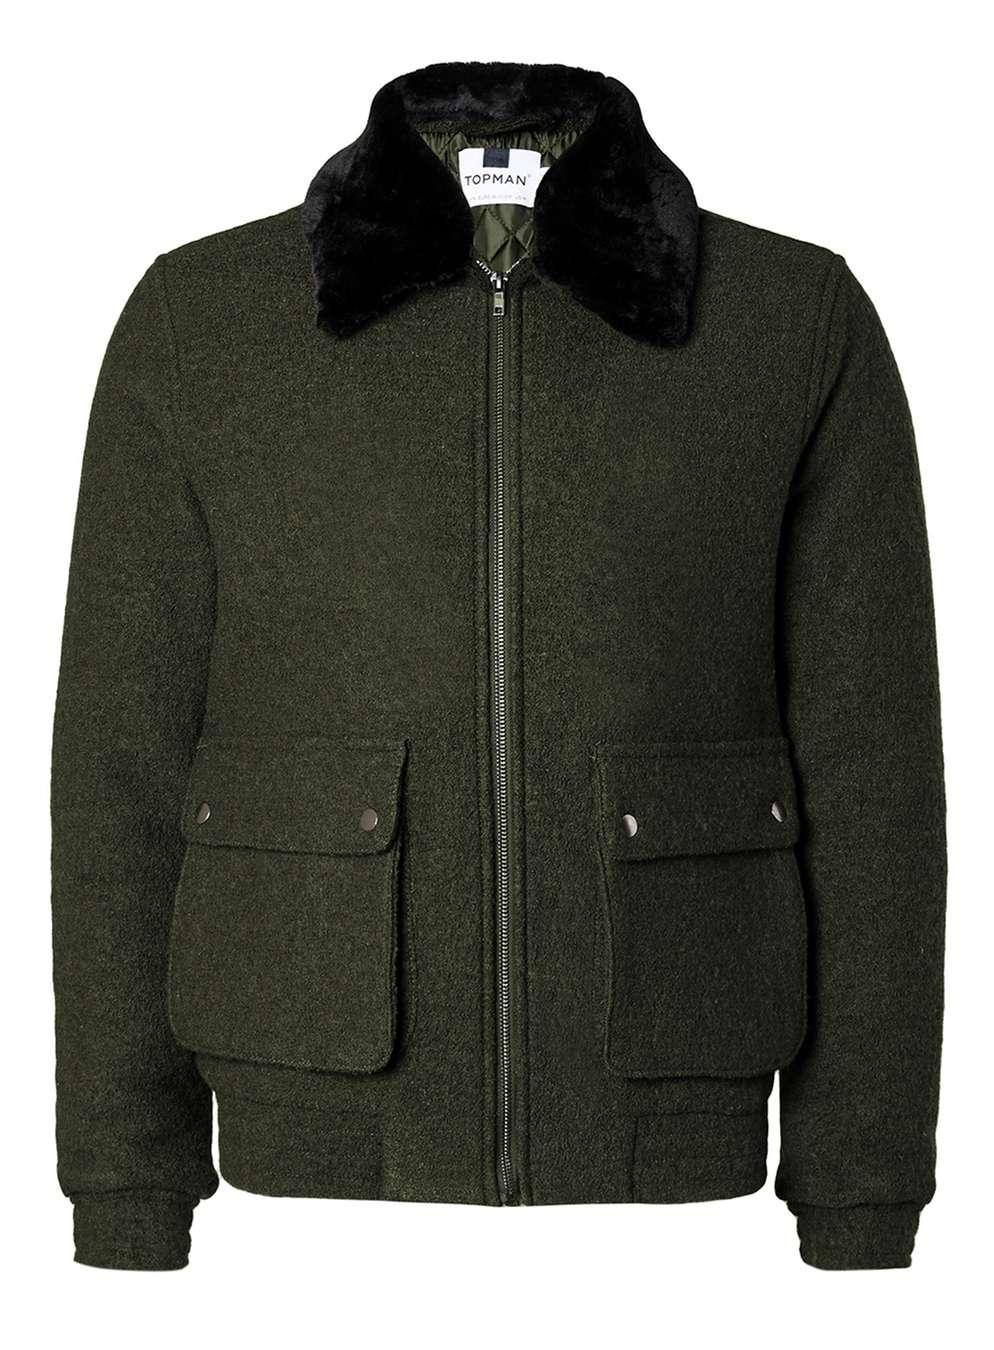 sam-c-perry-chunky-ribbed-knit-slim-chinos-topman-wool-coat.jpg